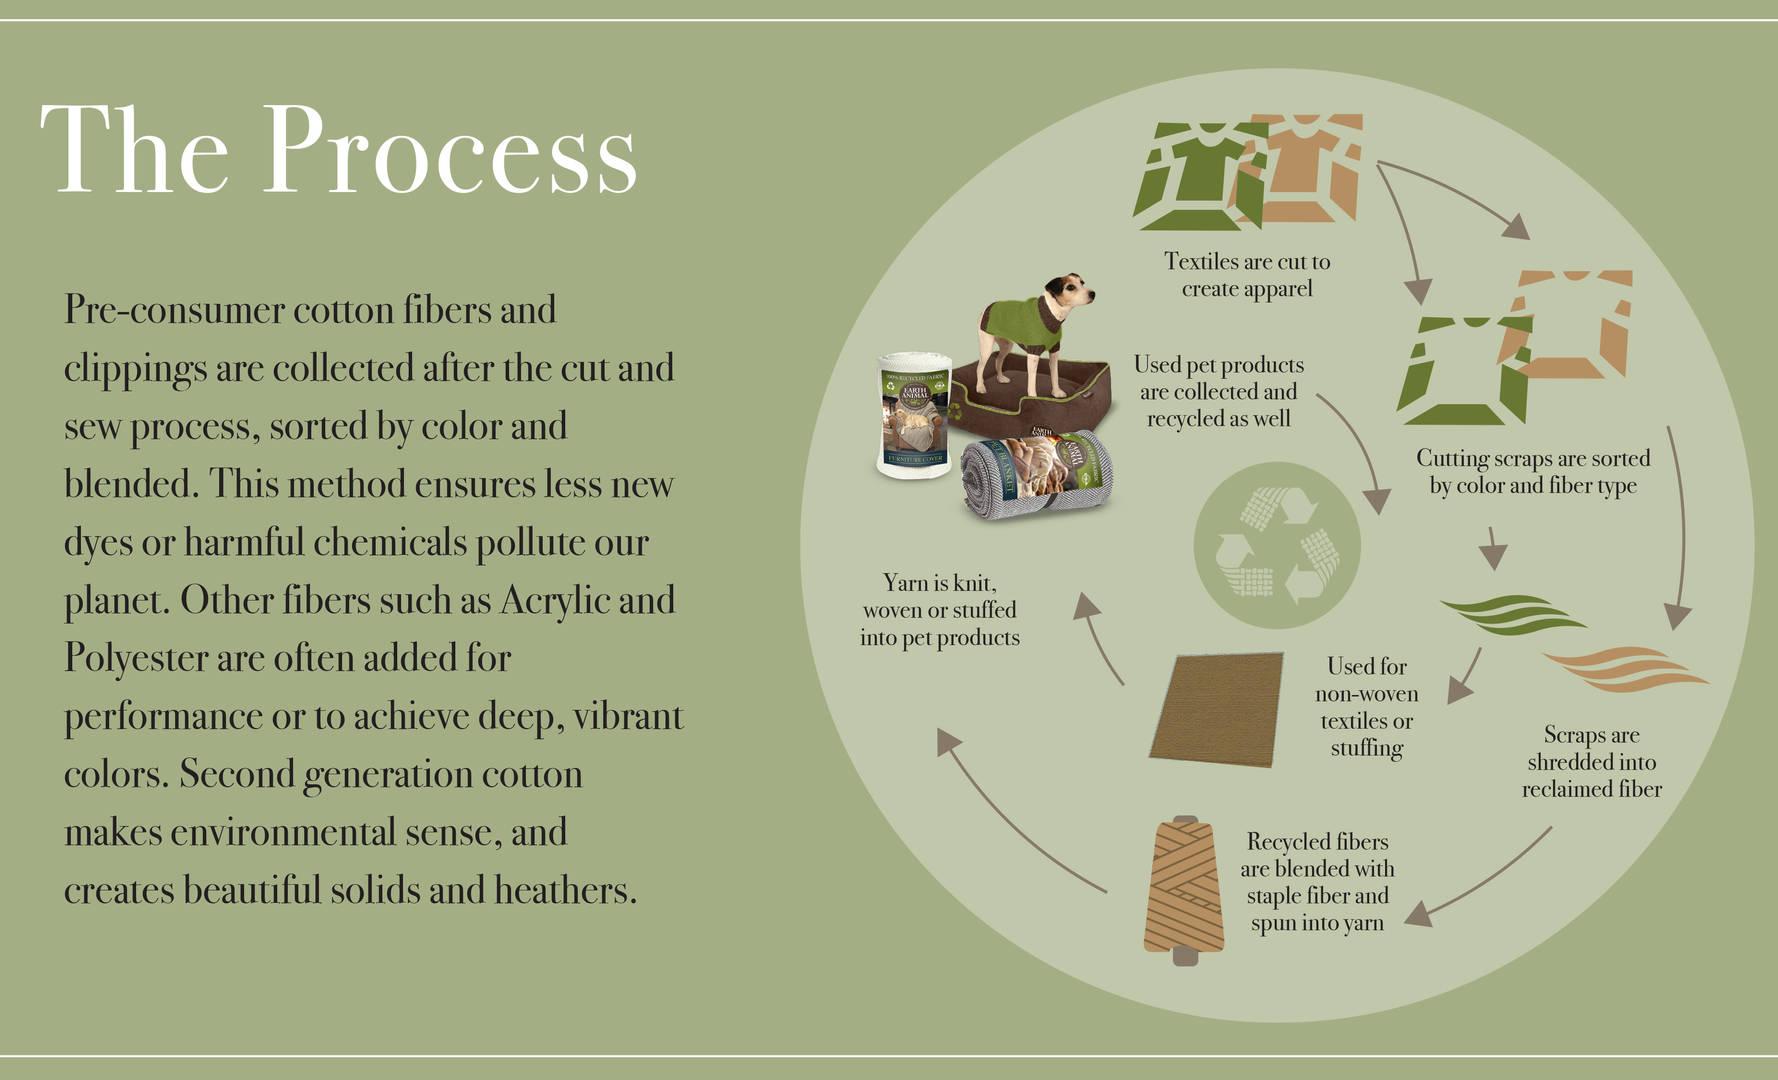 ASI+Earth Animal - presentation 10-19-17